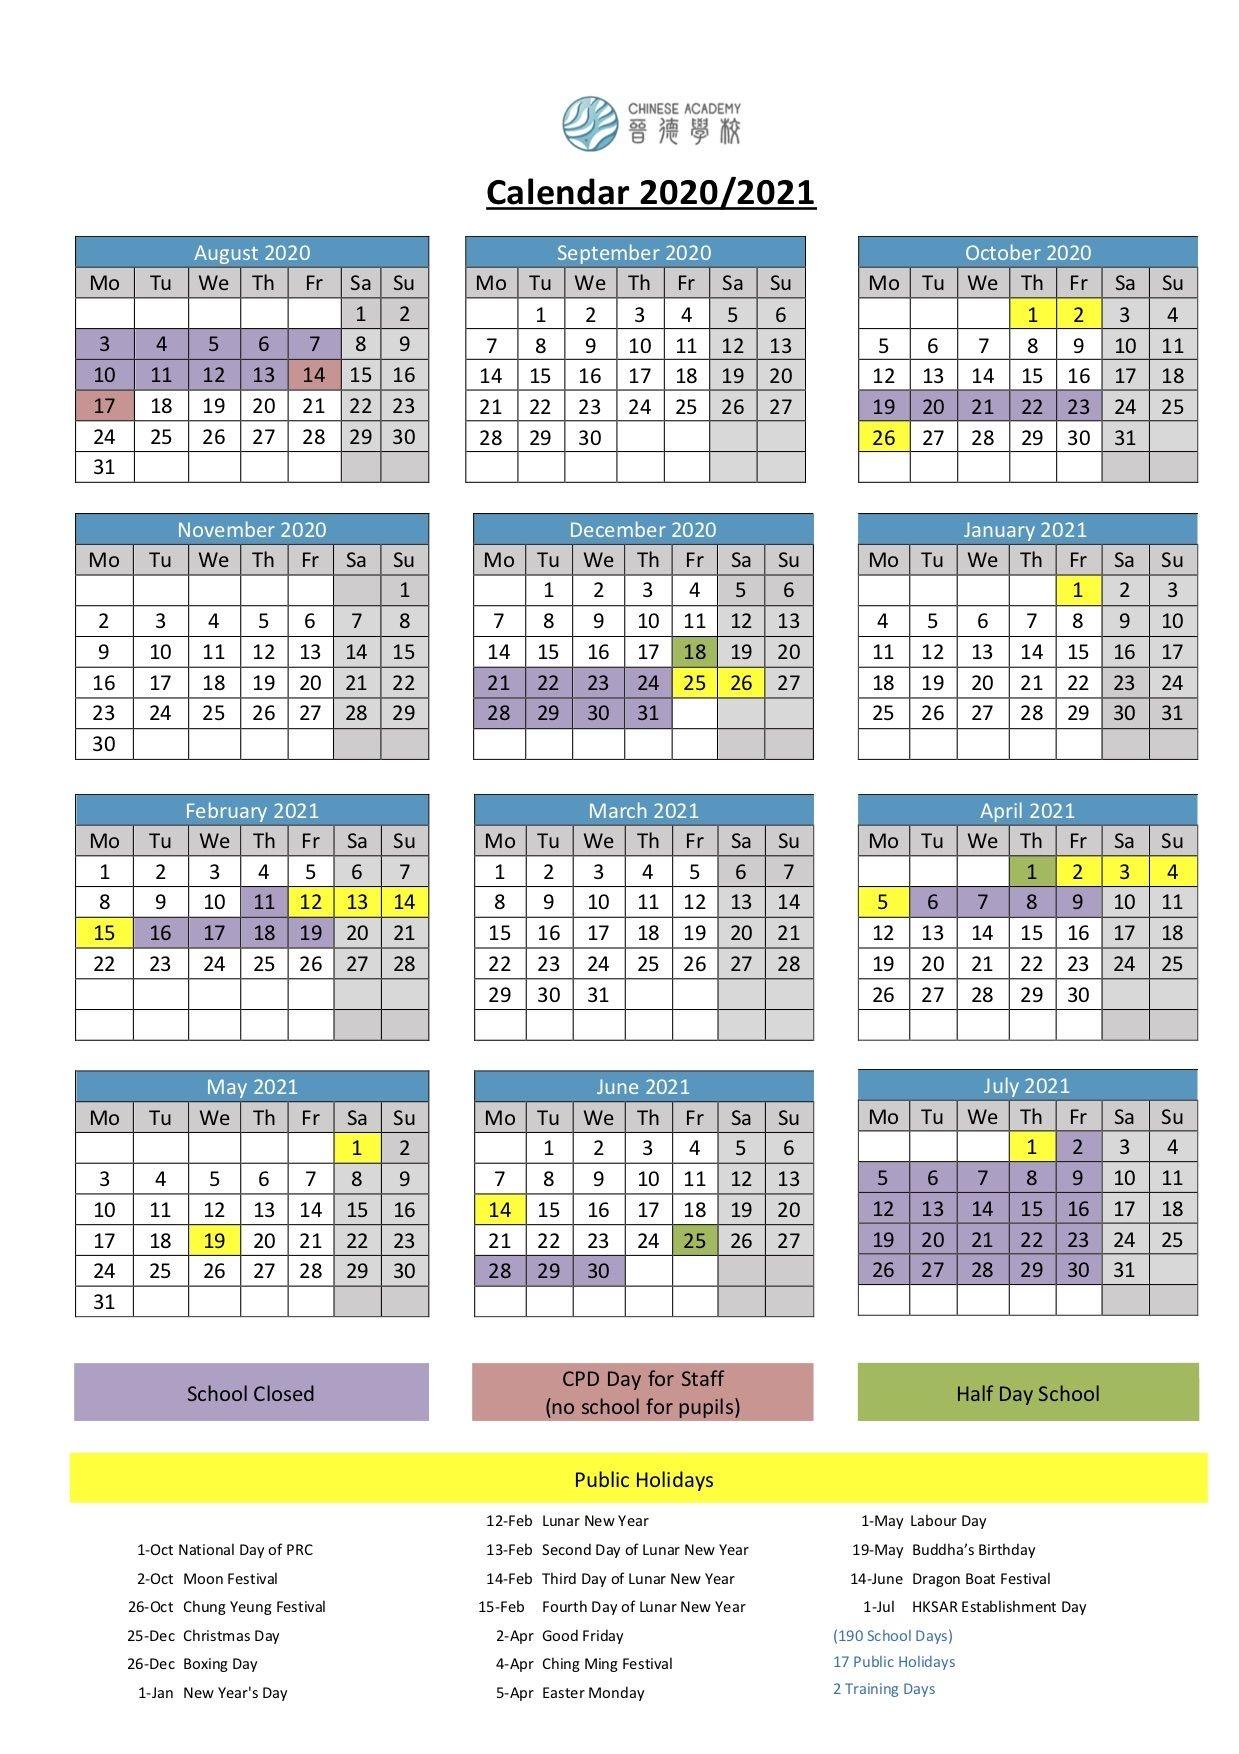 School Calendar 2020/2021 - Chinese Academy 晉德學校